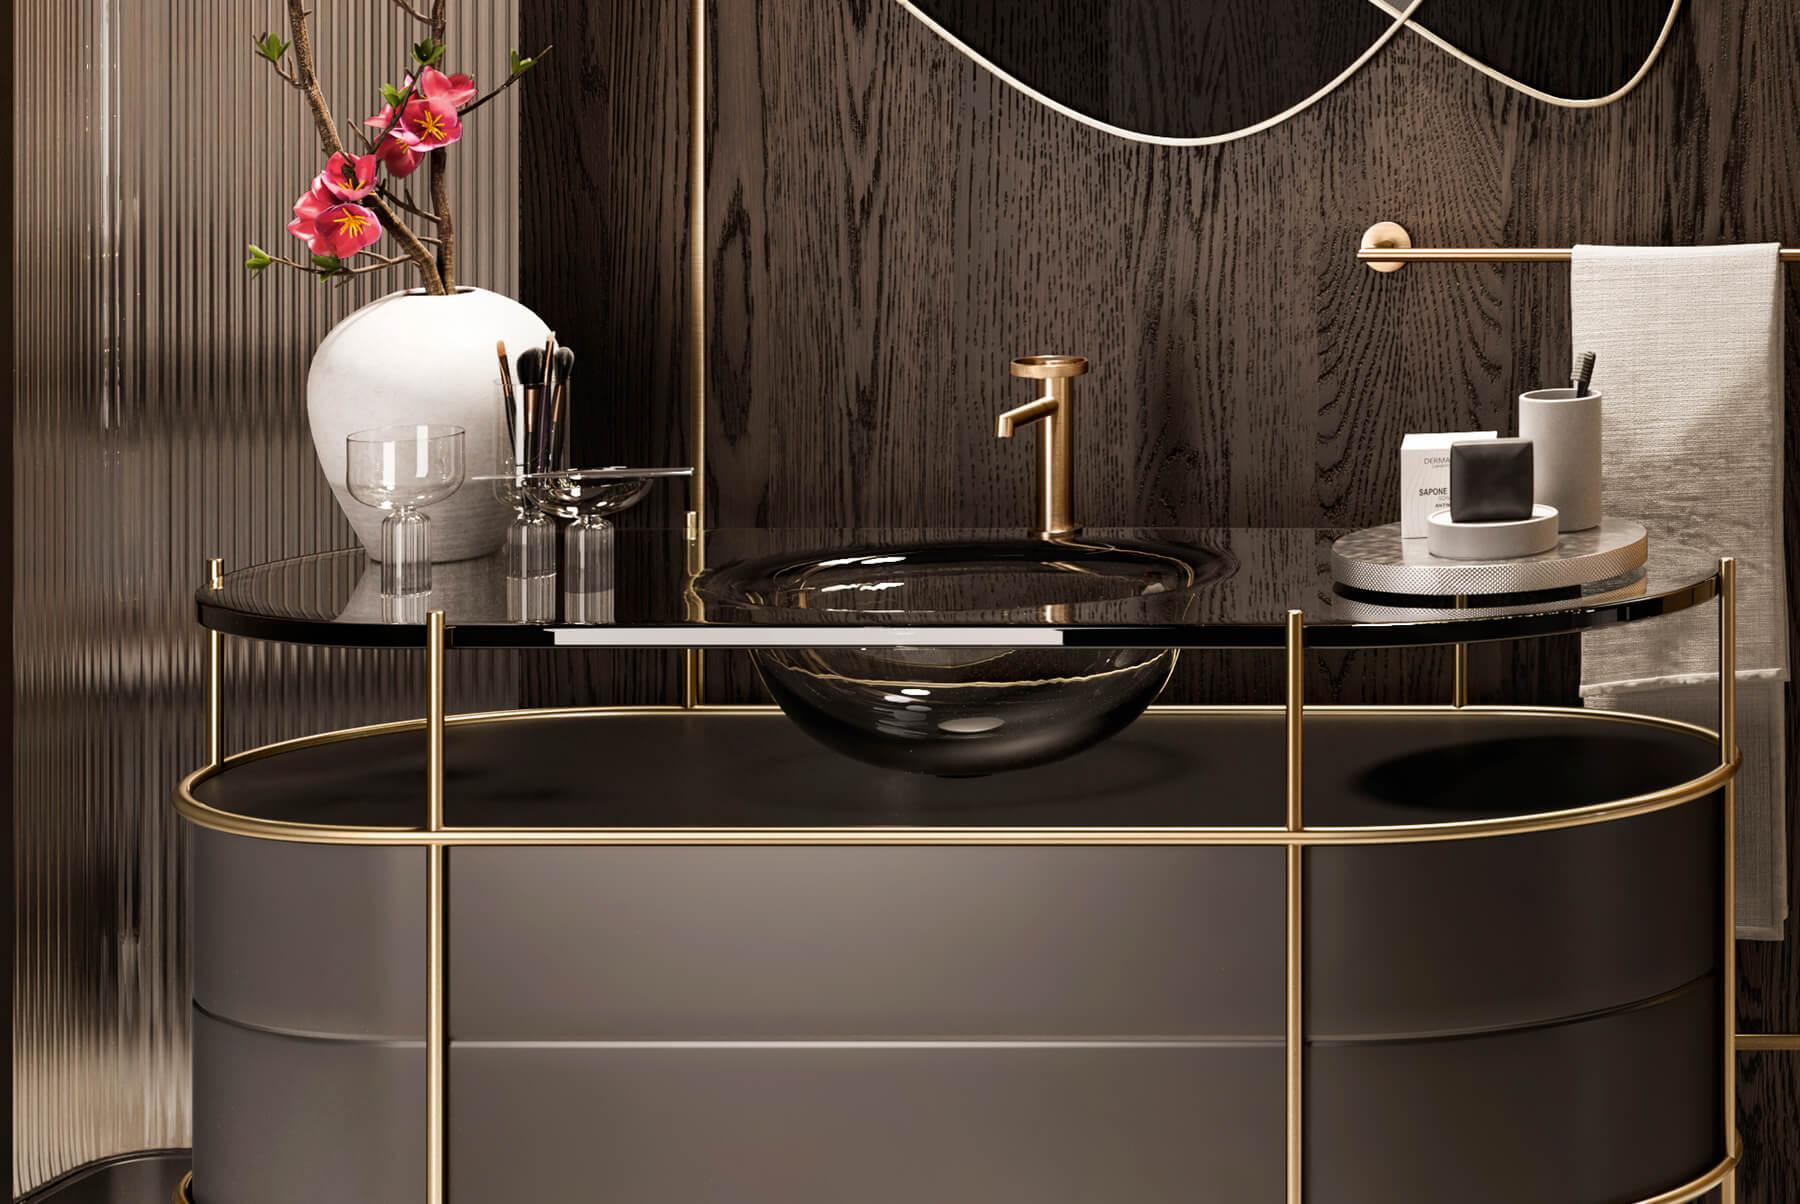 Brassware-GESSI-Anello-Inset-4-1800x1204